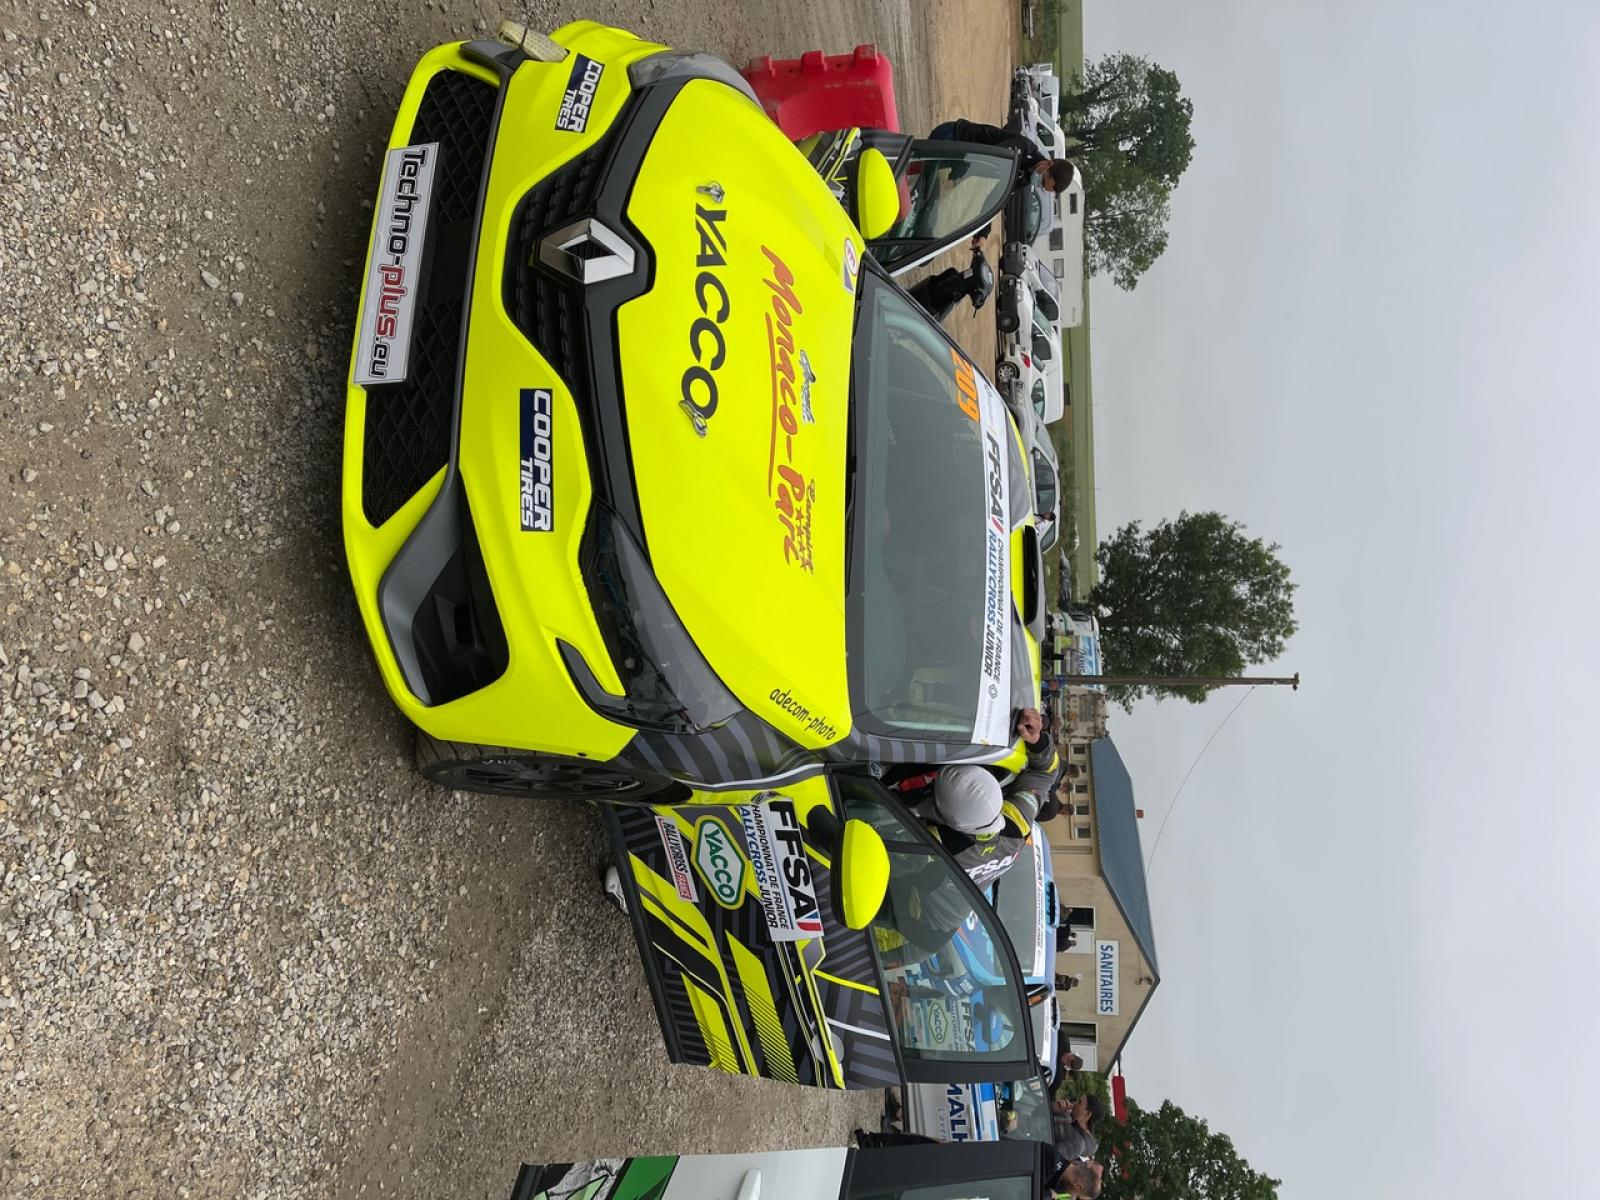 Renault Clio 5 RX - 3